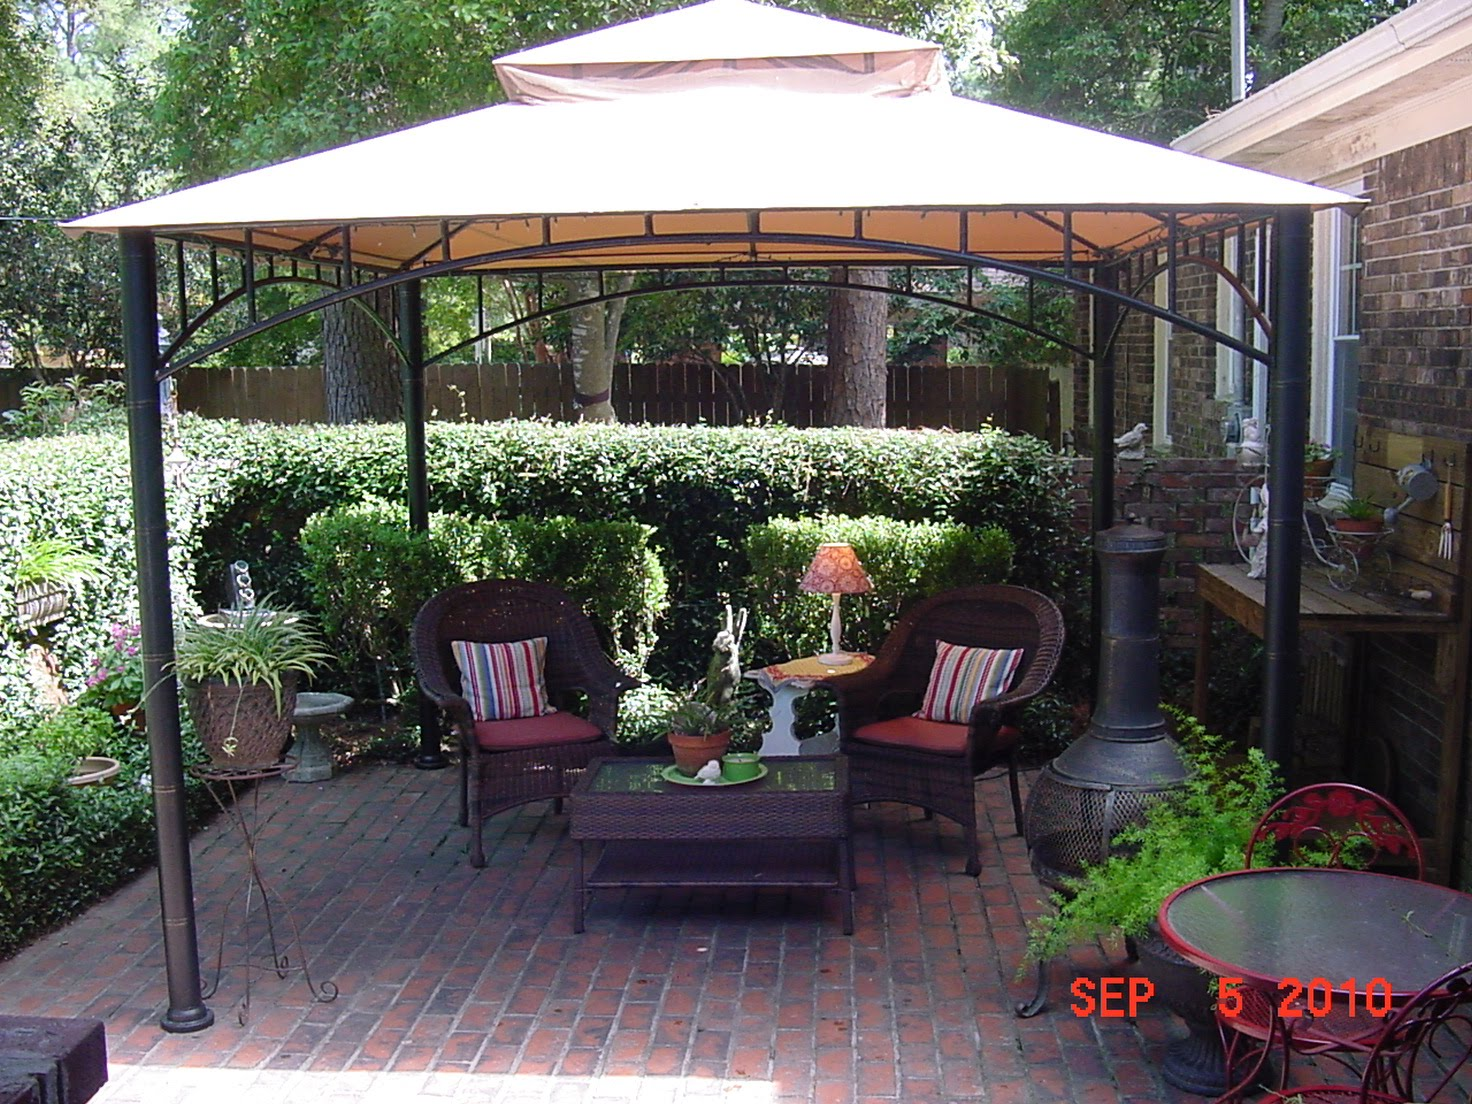 The Happy Homebody: My Patio Canopy